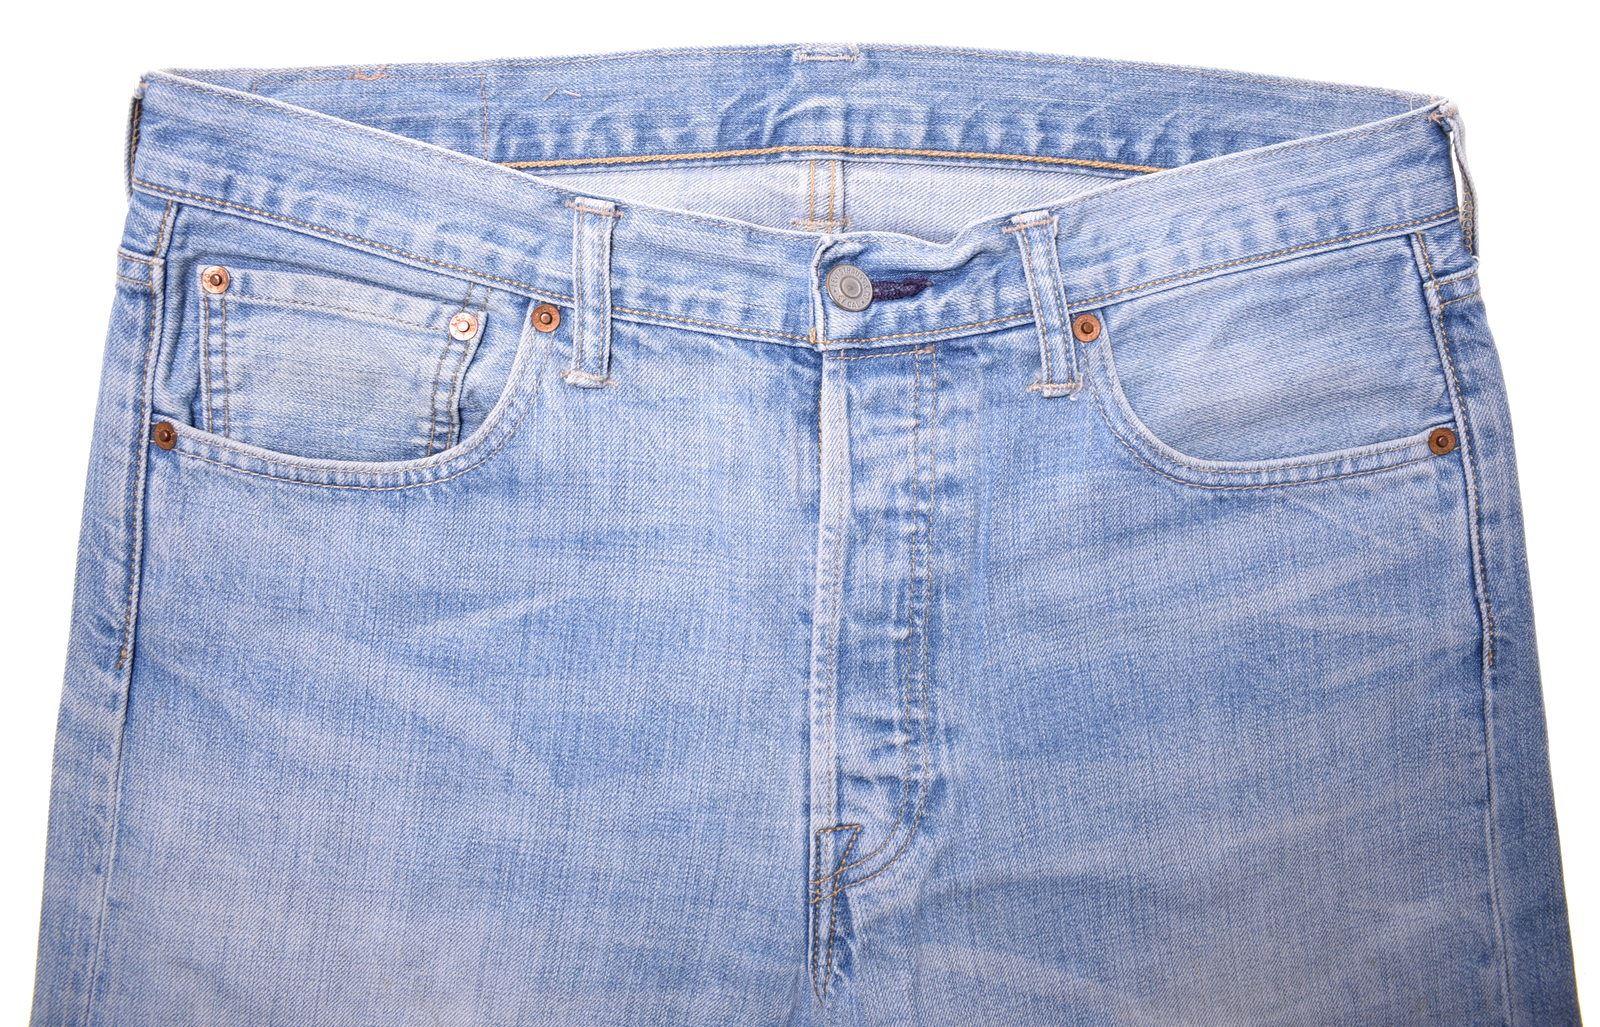 ed2dff61 LEVI'S Mens 501 Jeans W33 L34 Blue Cotton Straight CX04 | eBay